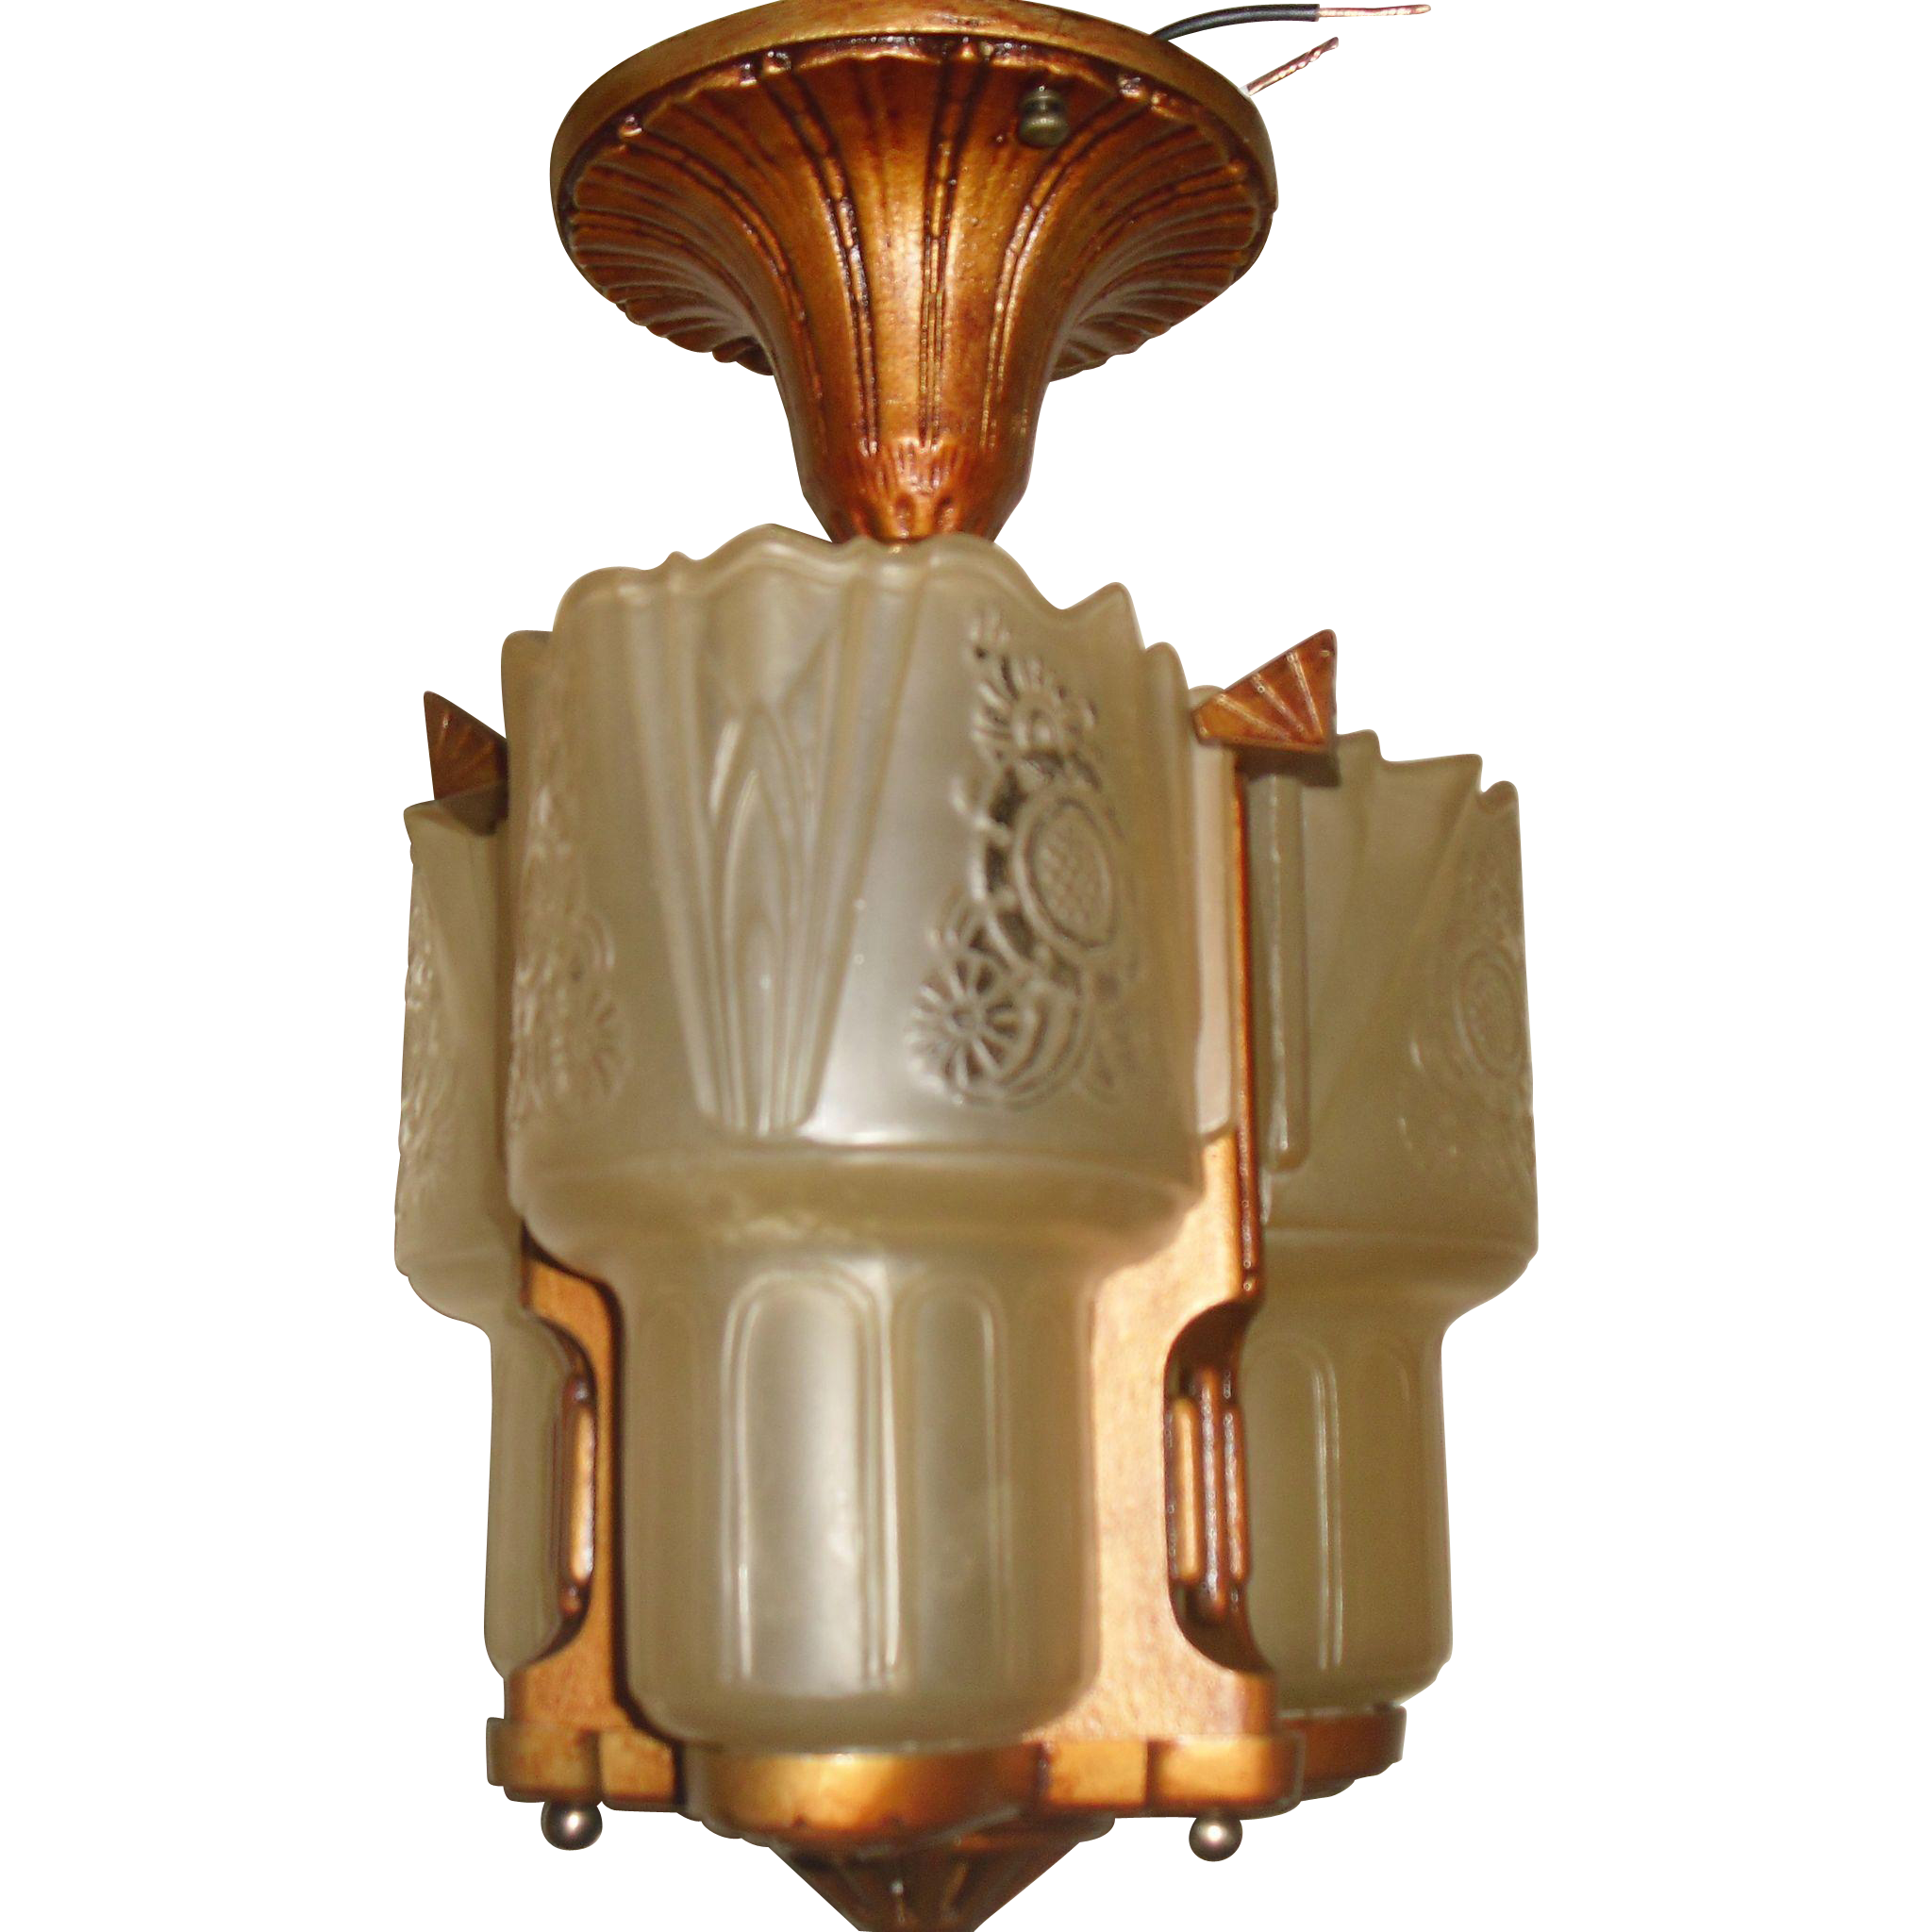 Lightolier Art Deco Slip Shade 3 Shade Ceiling Fixture